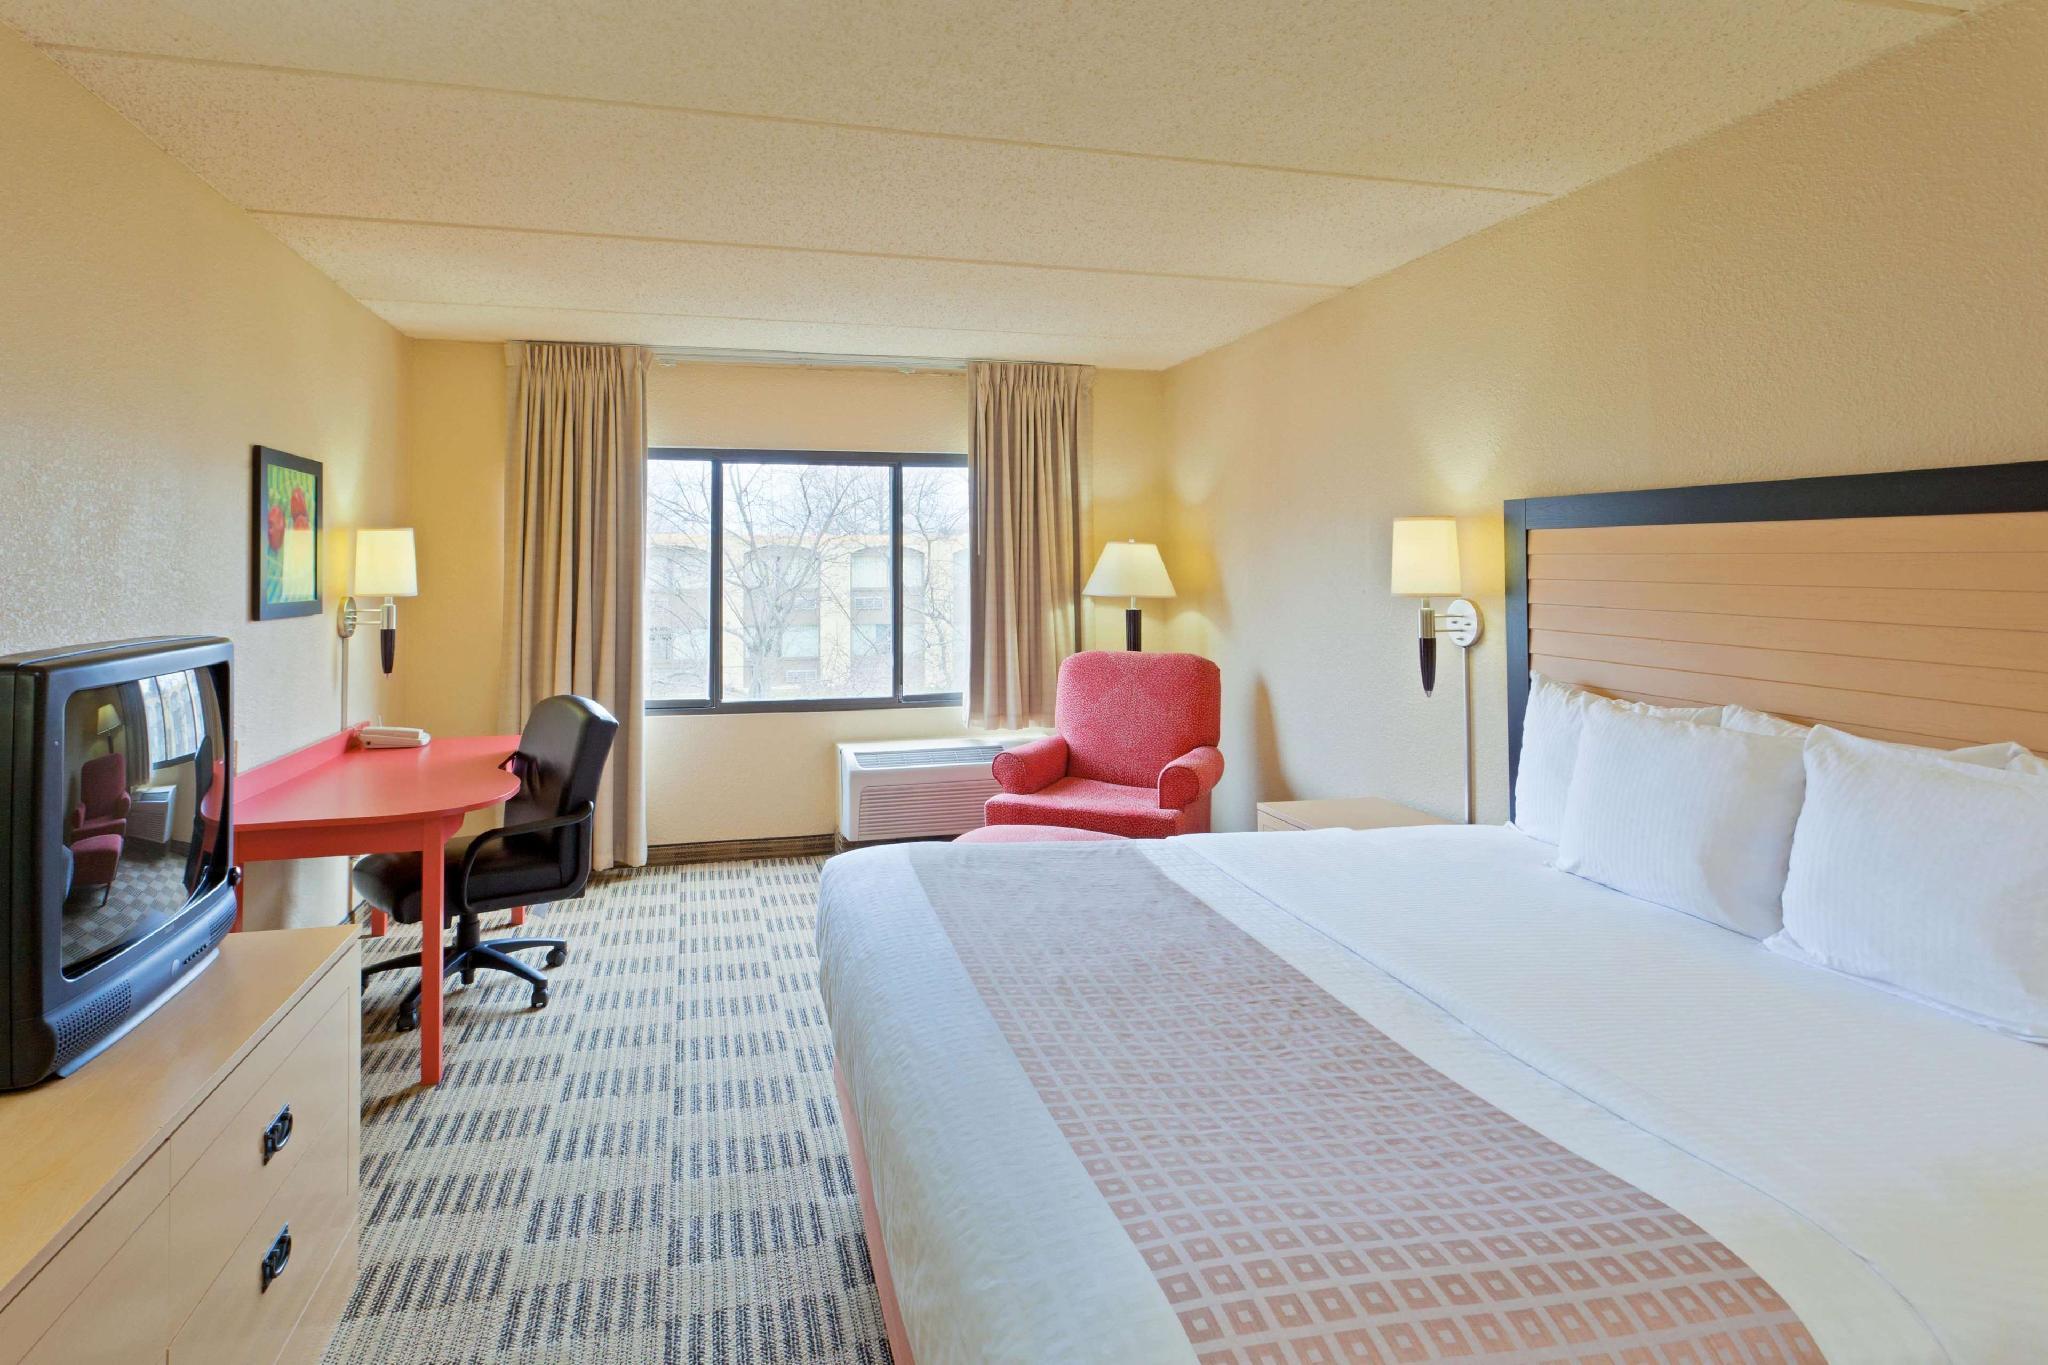 La Quinta Inn & Suites By Wyndham Armonk Westchester